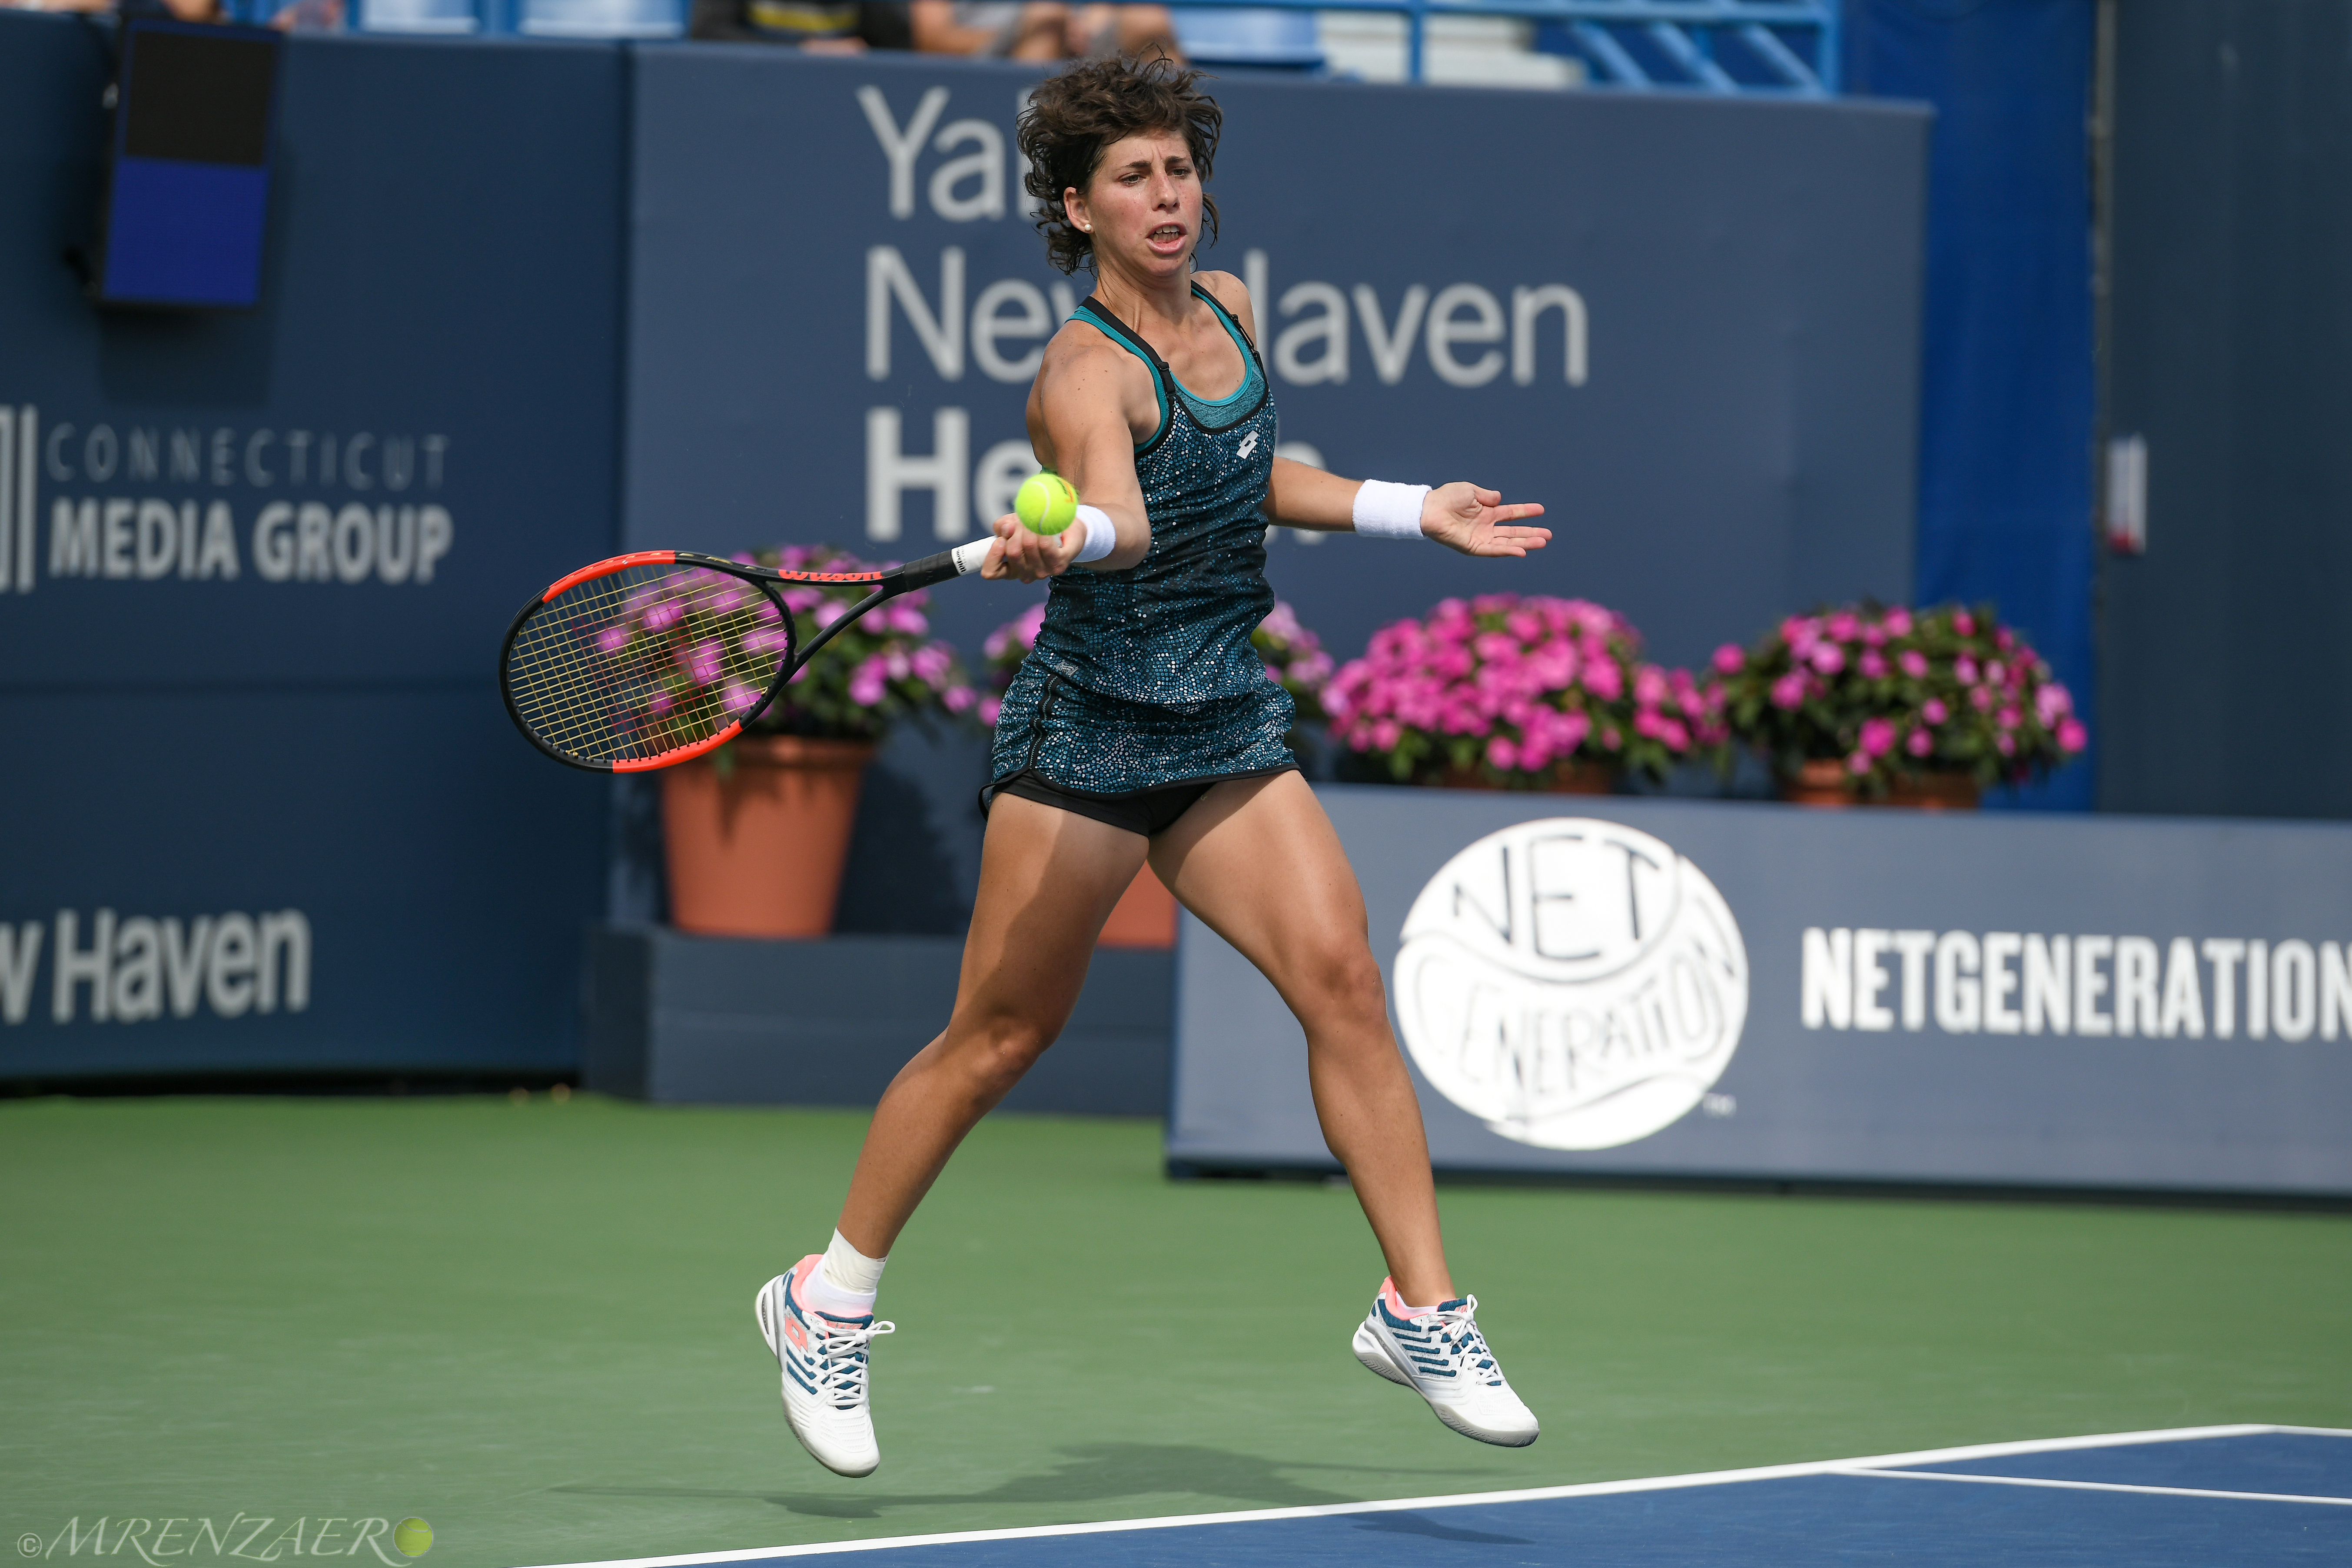 Carla Suarez Navarro, 2018 Connecticut Open, (Photo: Mike Renz for Tennis Atlantic)